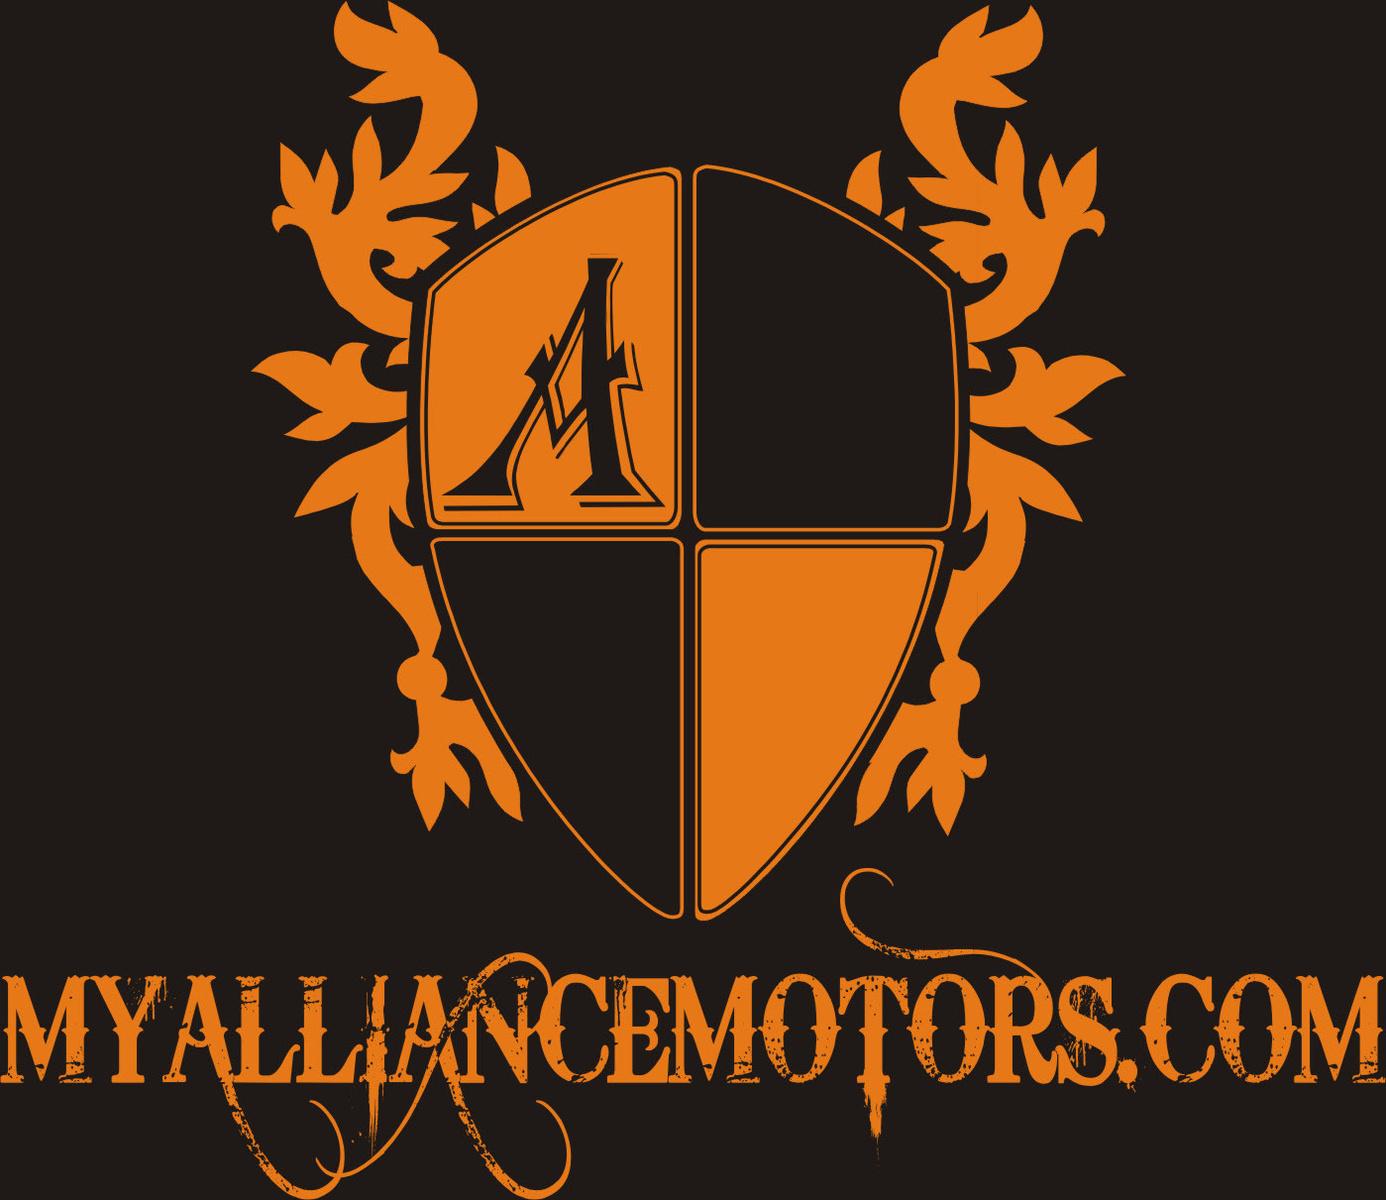 Acura Springfield Mo >> Alliance Motors LLC - Springfield, MO: Read Consumer ...